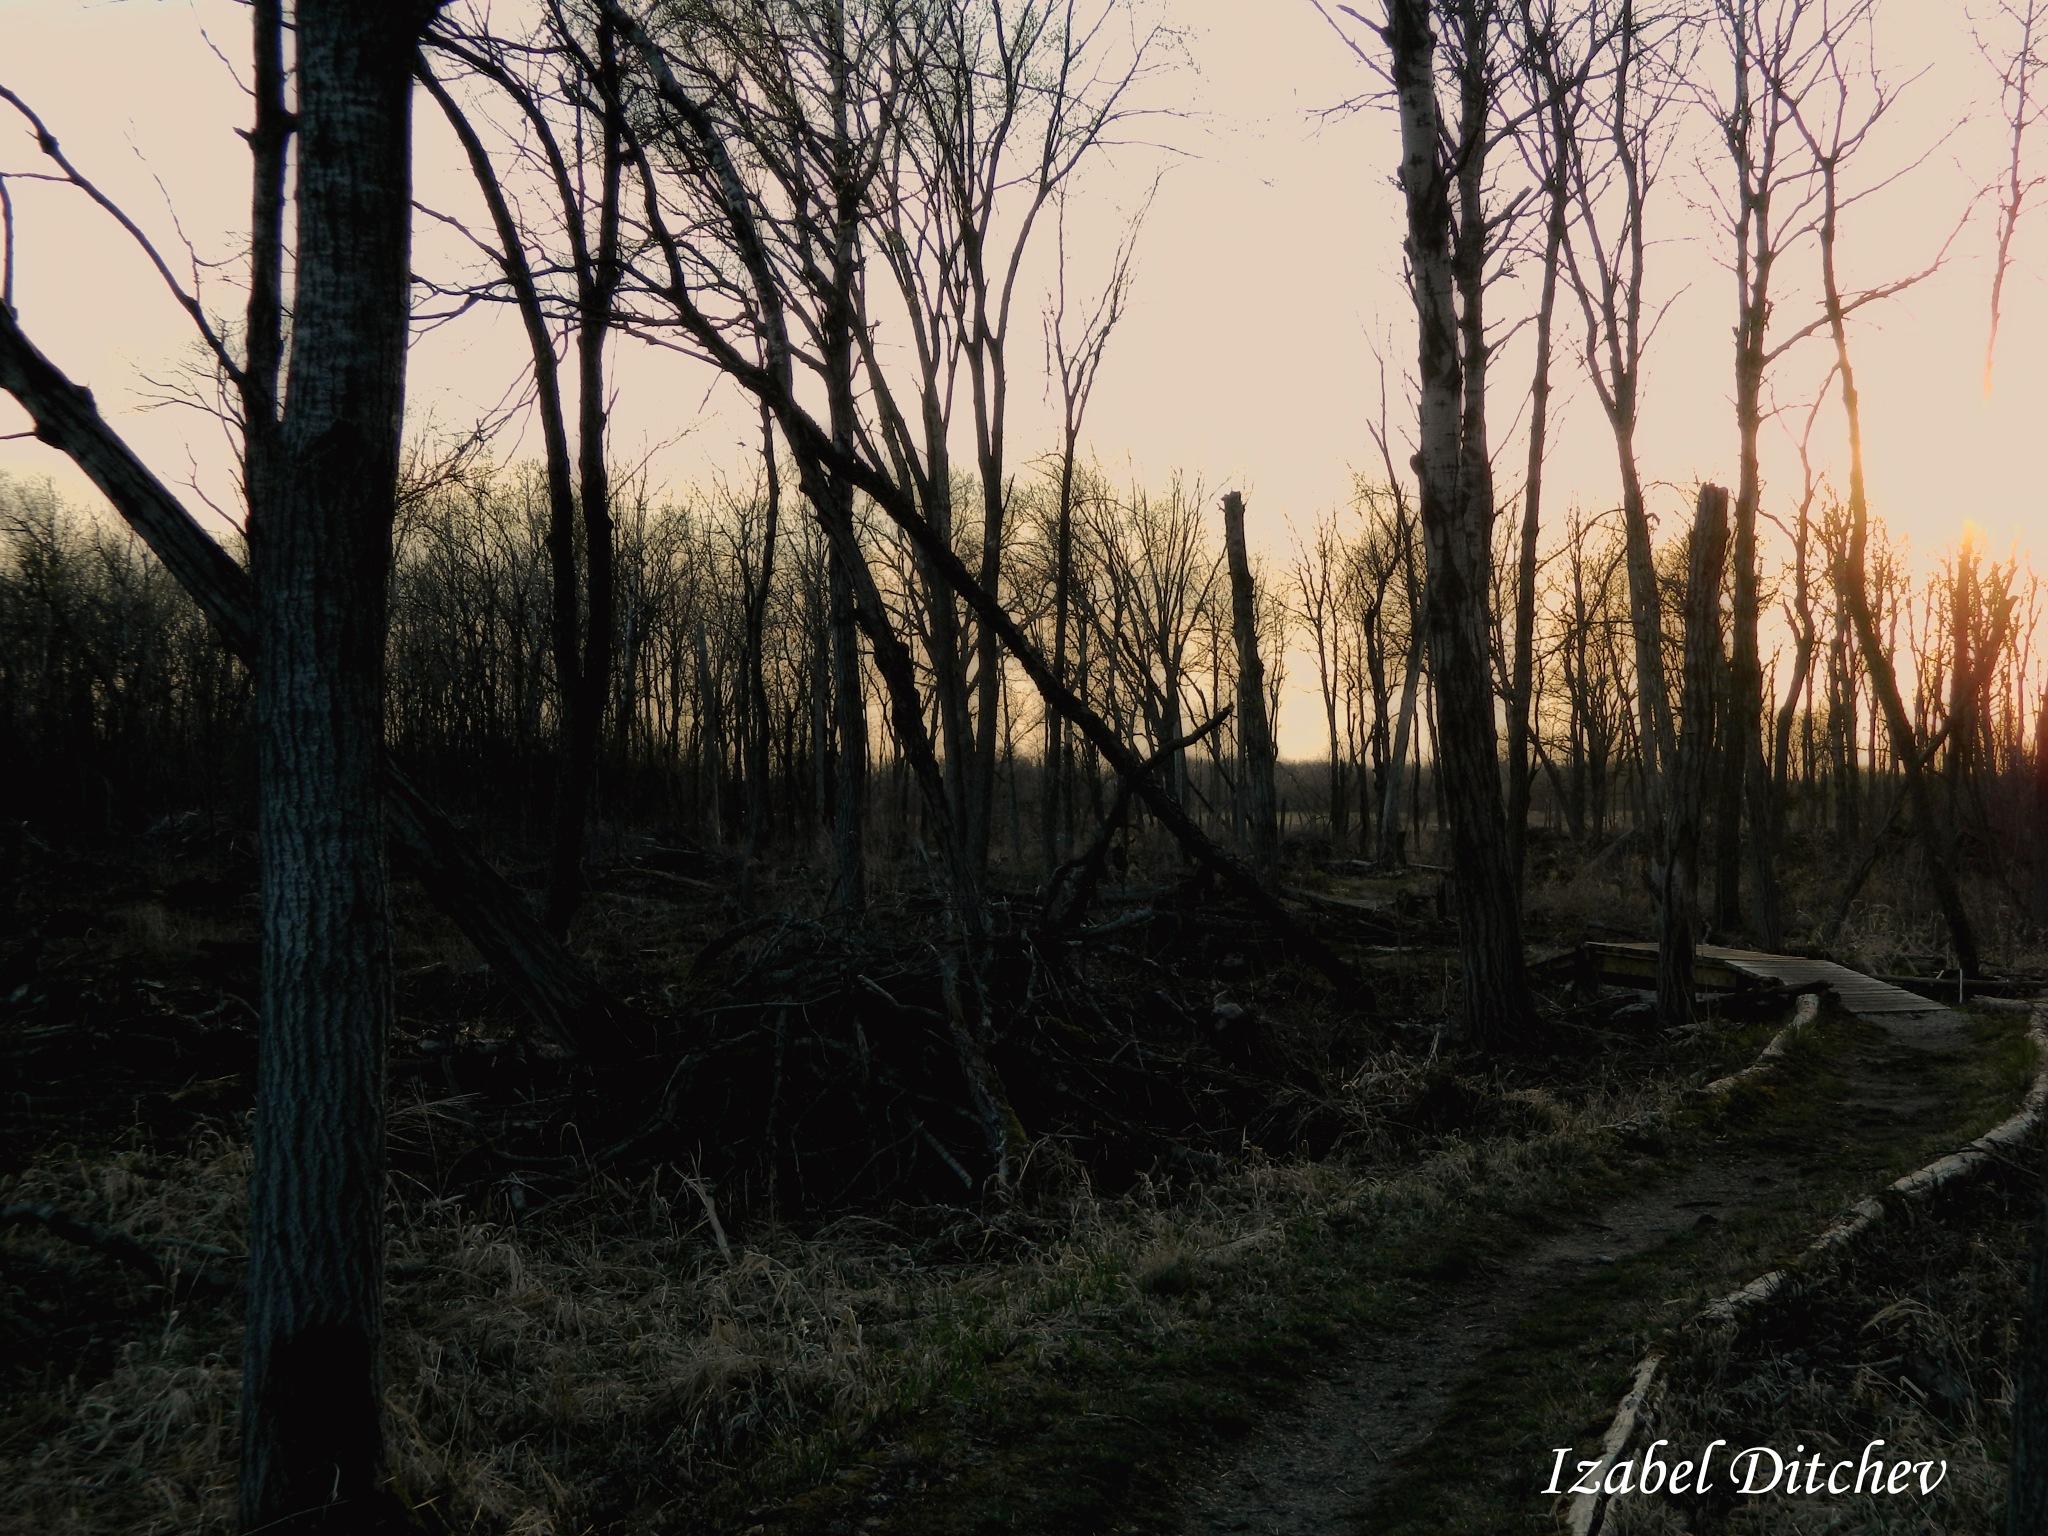 Untitled by Izabel Ditchev